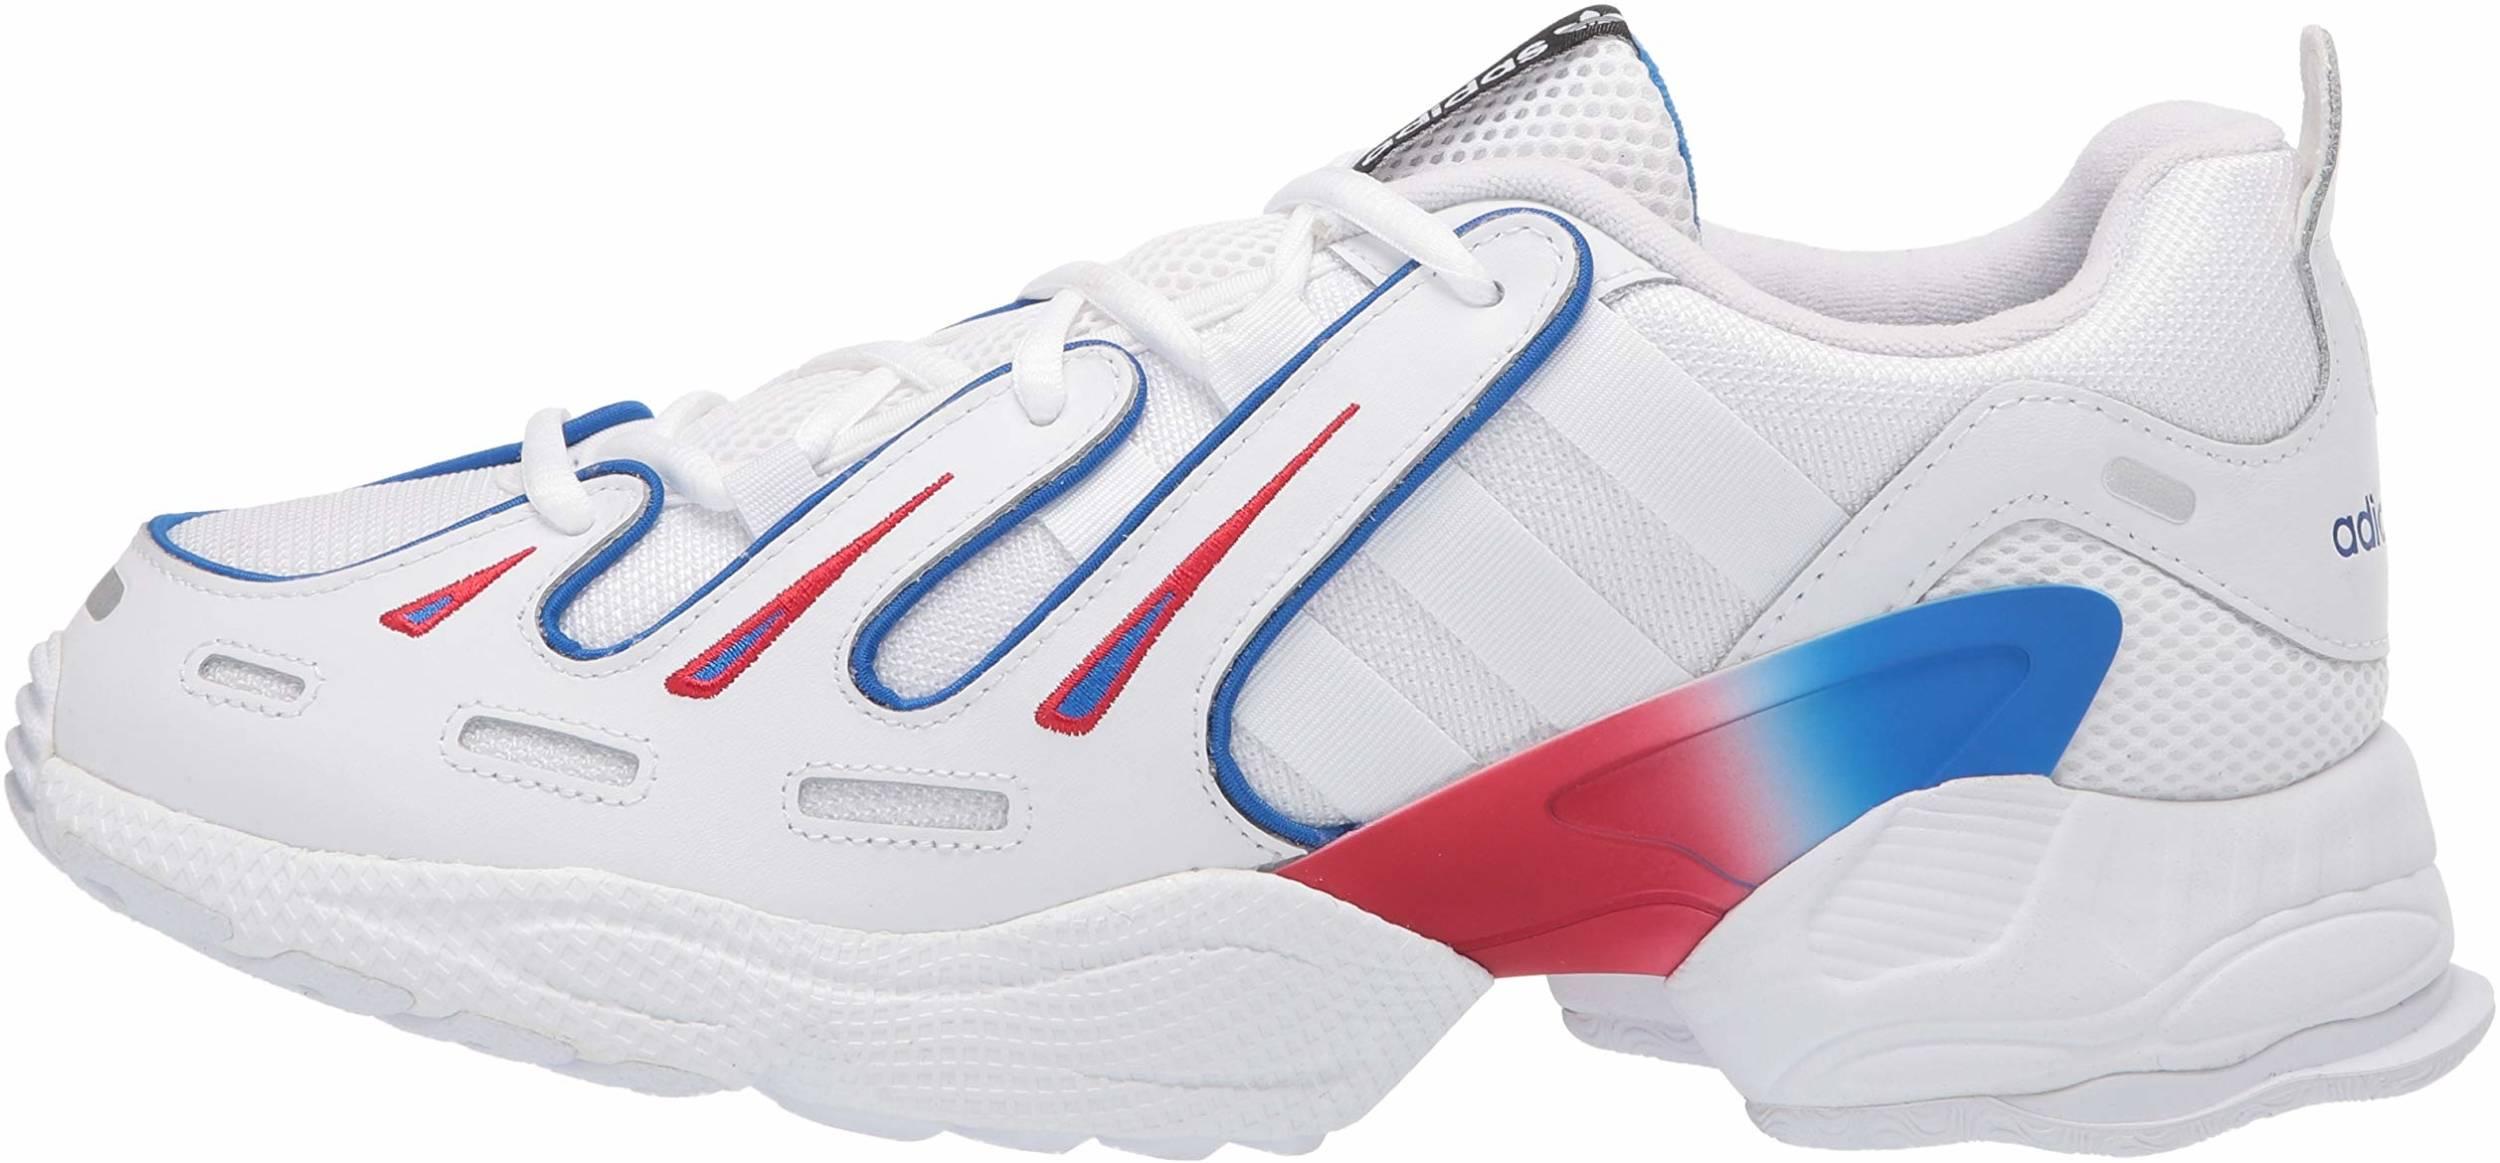 Sneakers Damenschuhe 4431 Ital-design